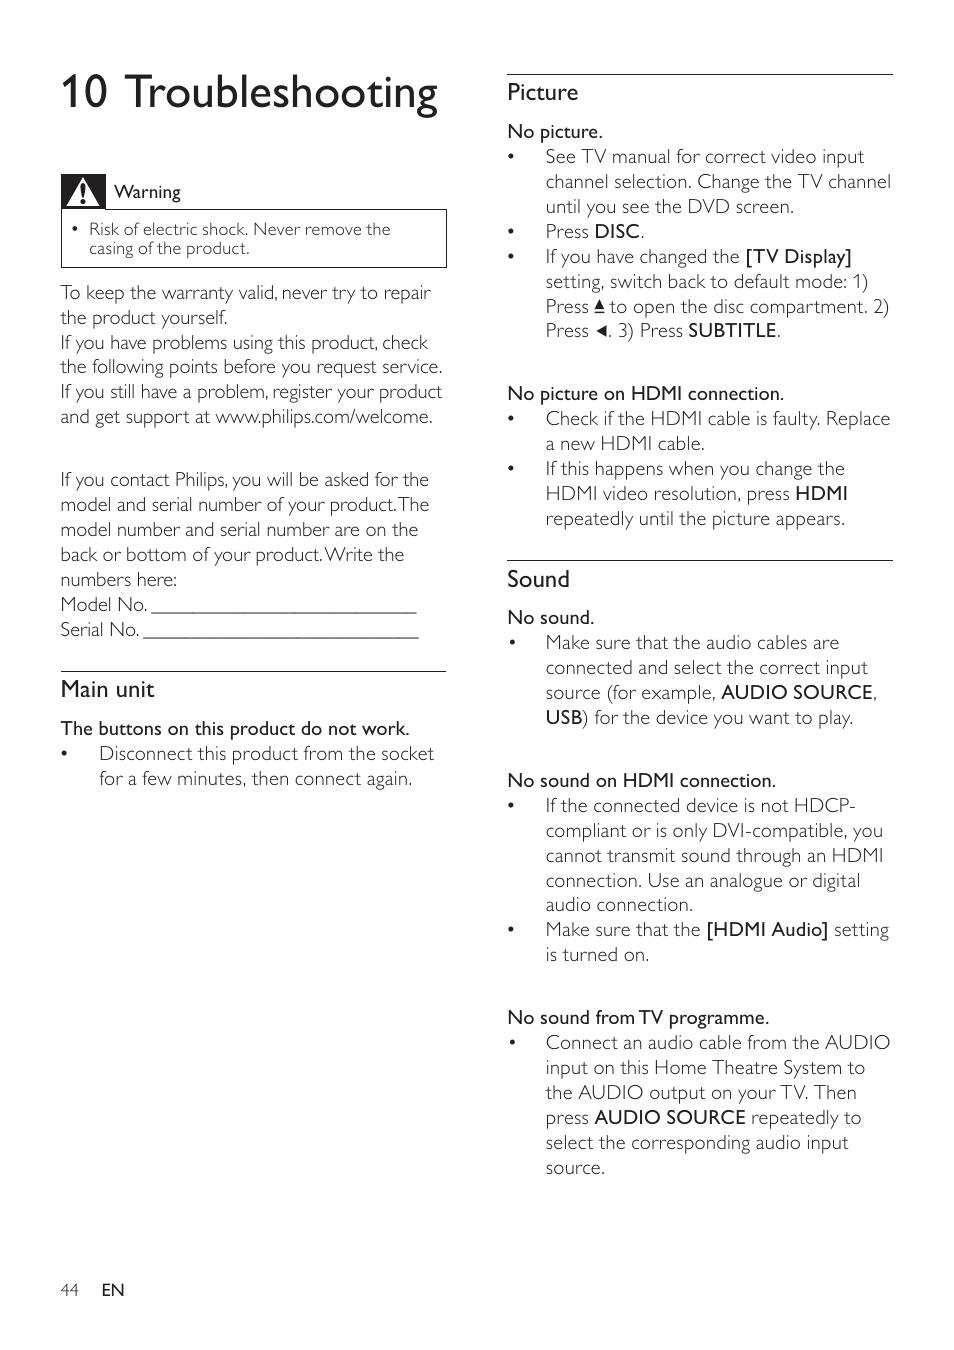 10 troubleshooting   Philips SoundBar HTS6120 User Manual